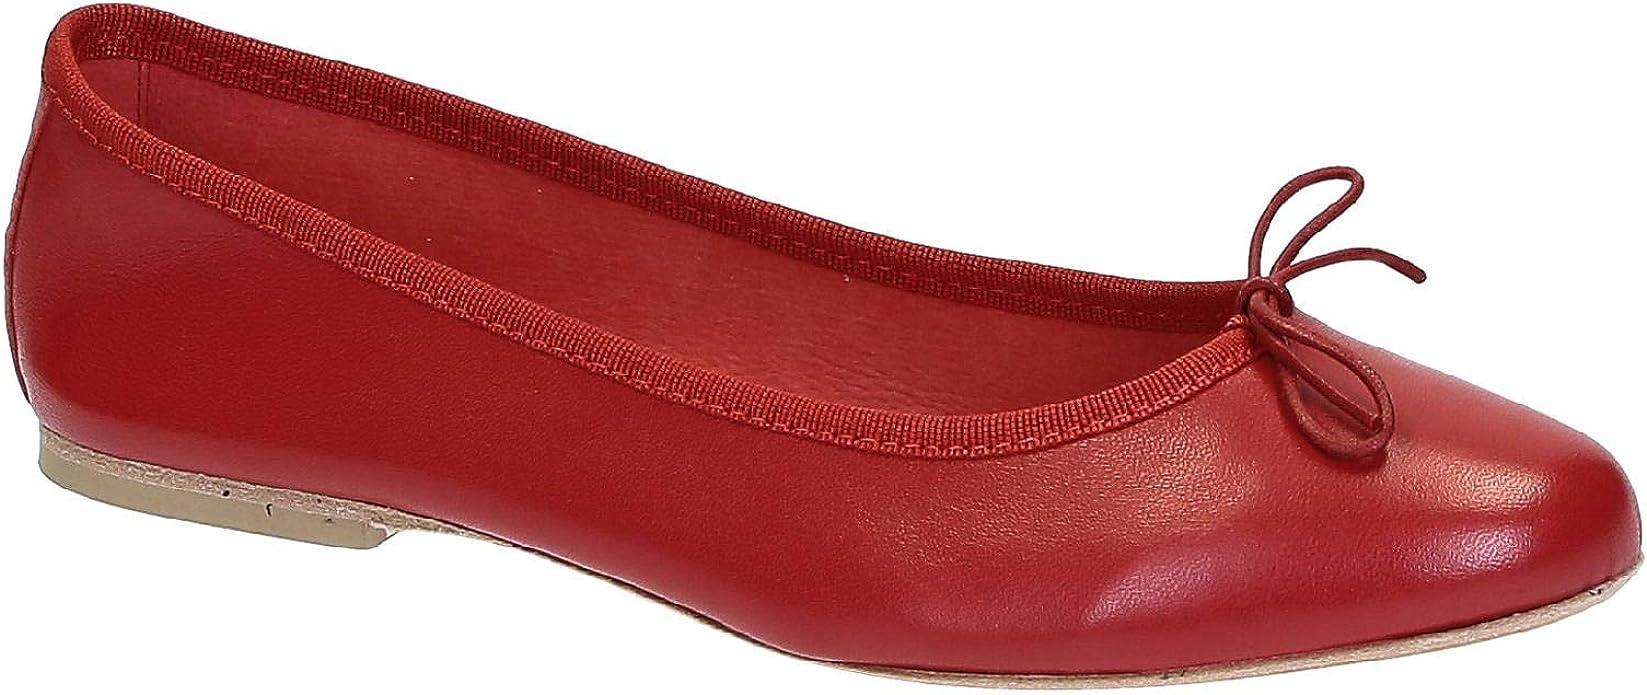 Calf Leather Ballerina Shoes